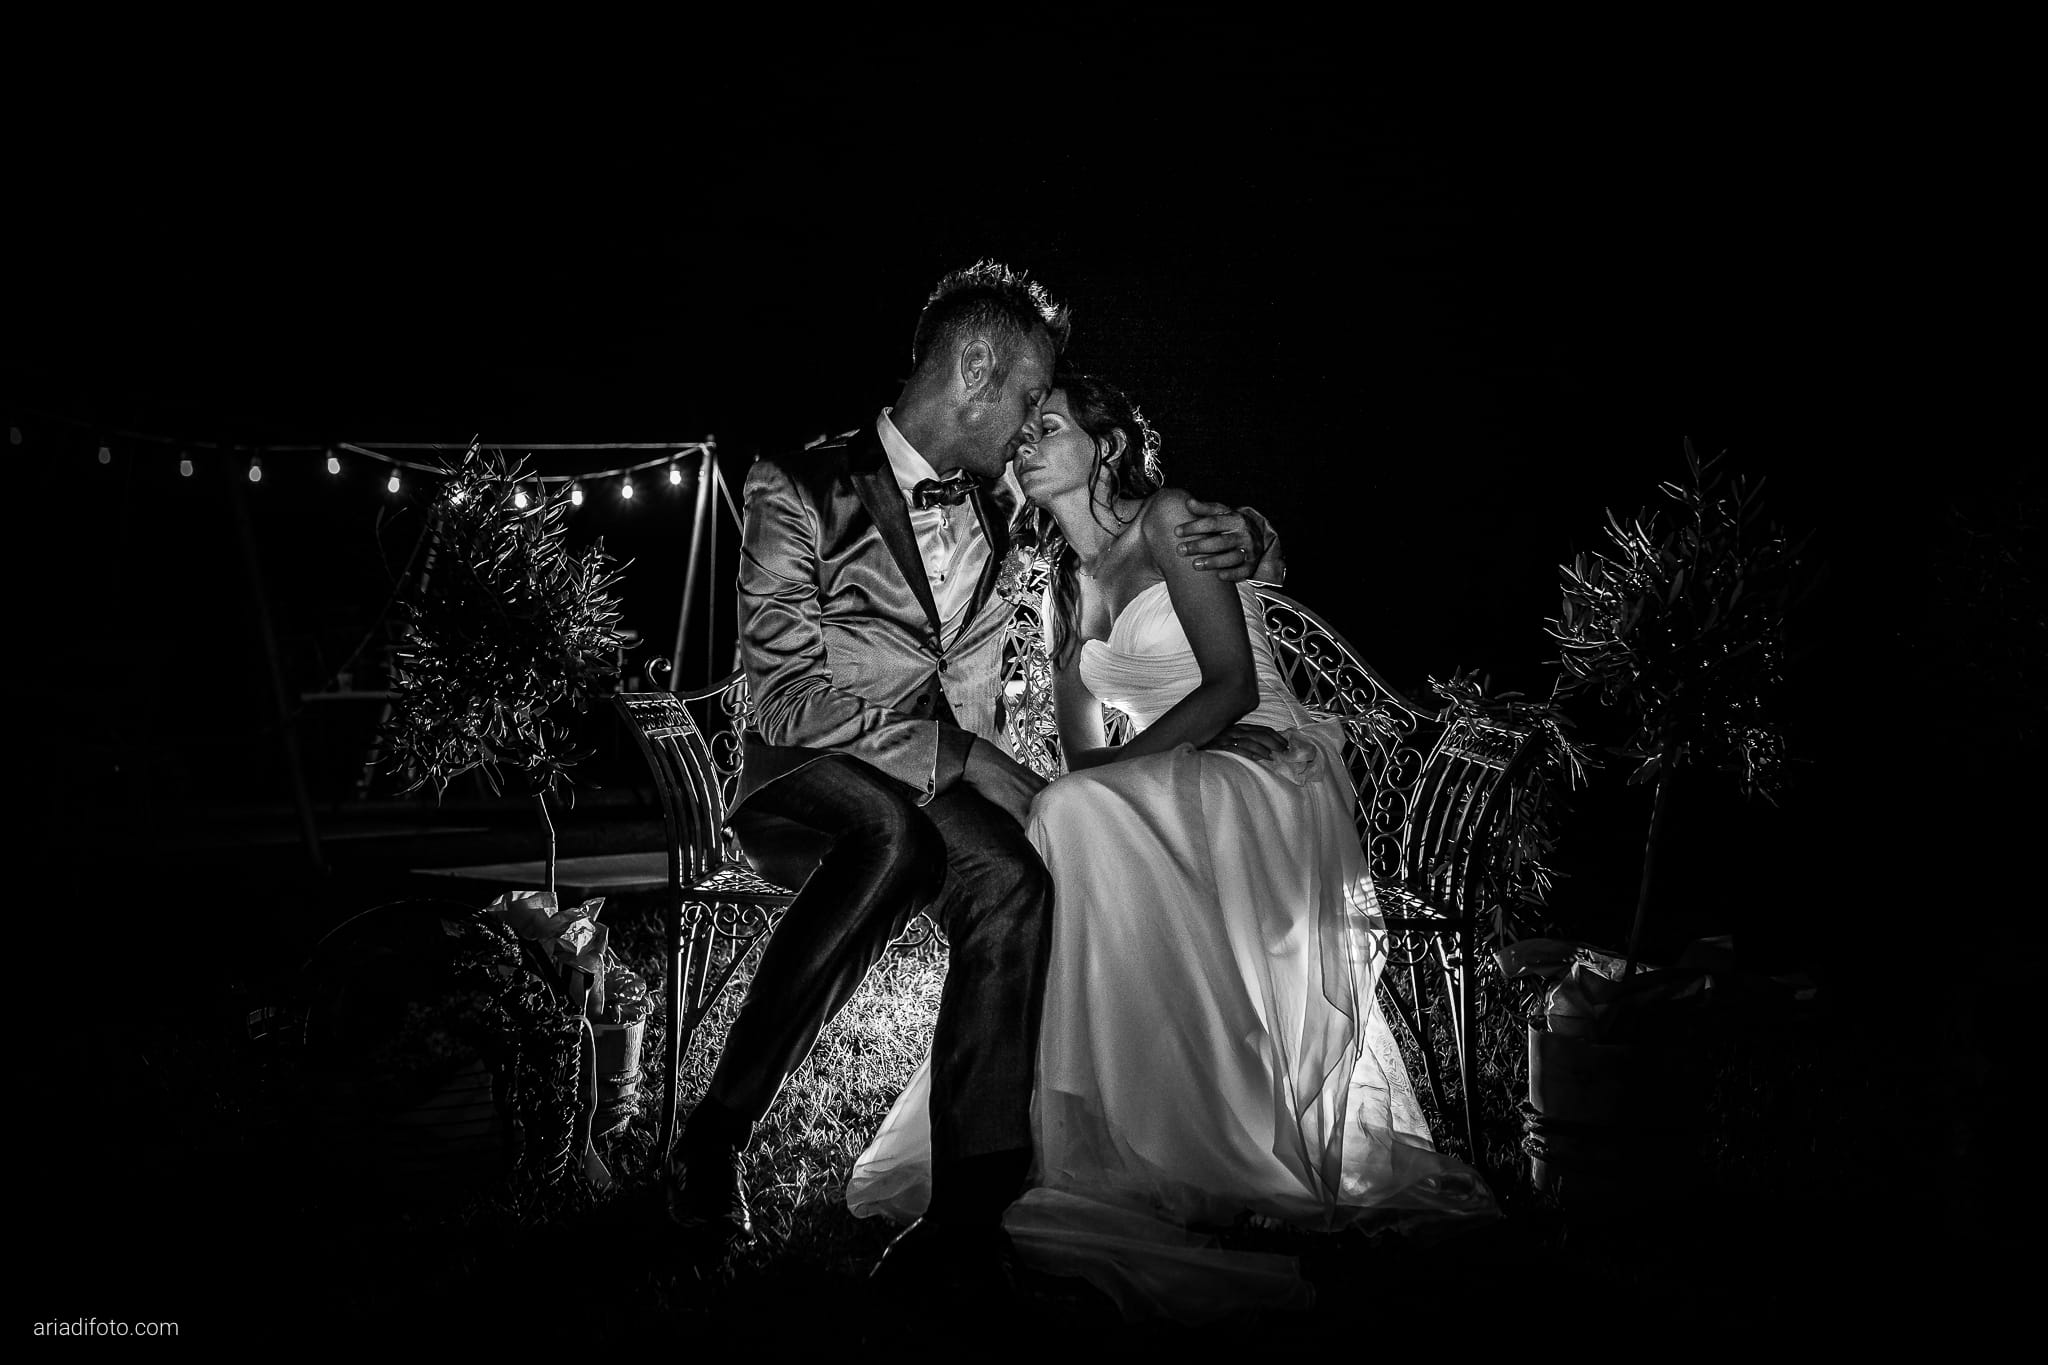 Stefania Raffaele Matrimonio Country Chic Outdoor Gorizia ritratti sposi notturni